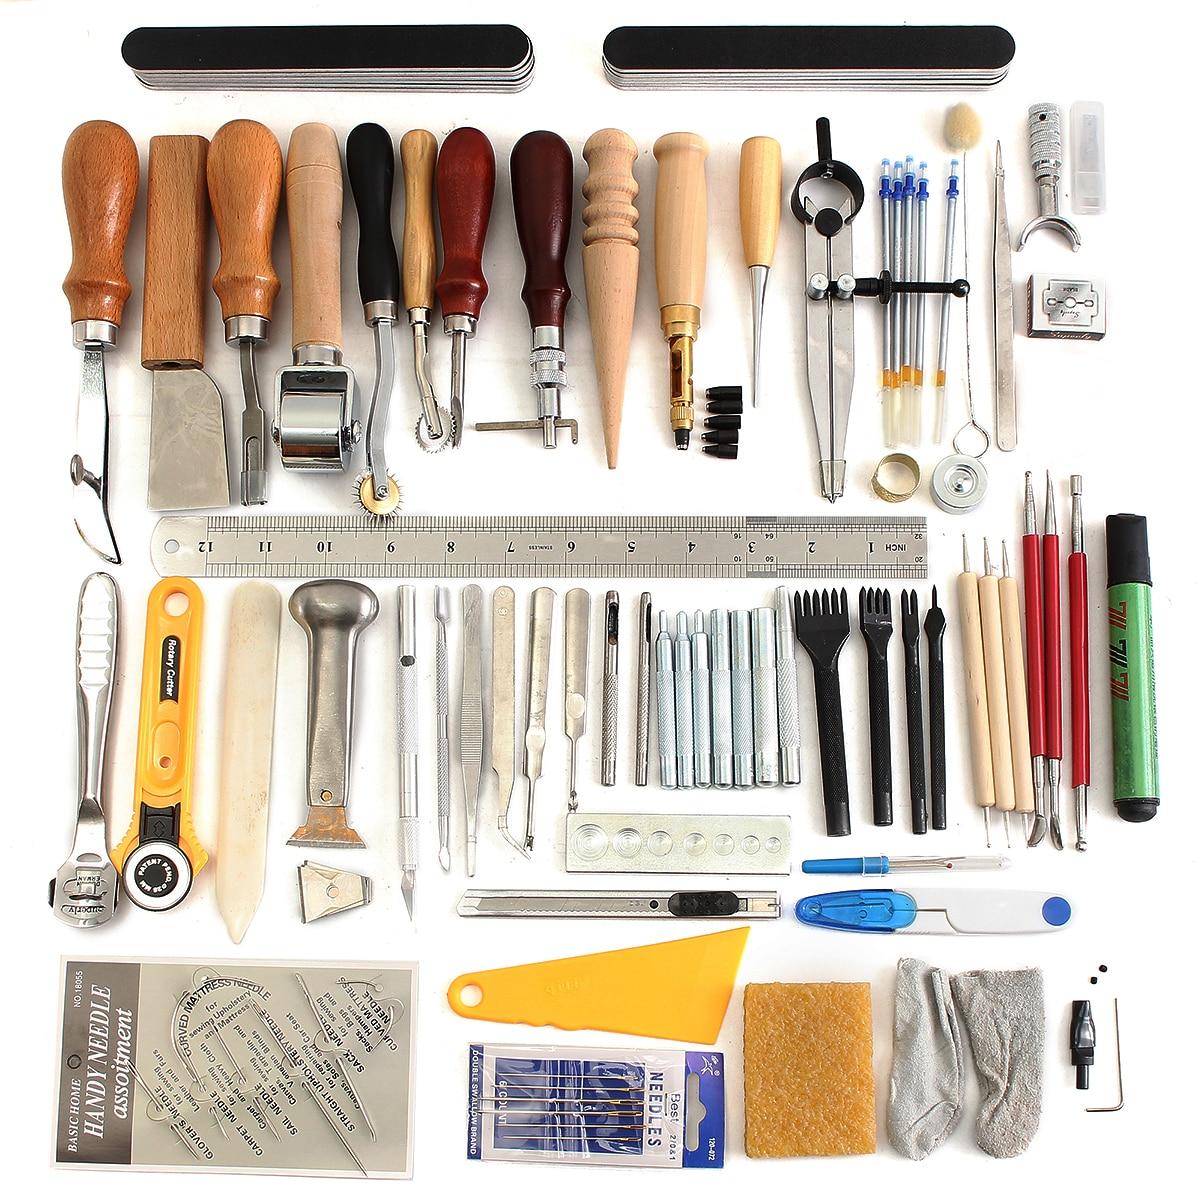 KiWarm Professional Leather Craft Tools 59Pcs DIY Hand Sewing Stitching Carving Work Set Kit Punch Awl Leathercraft Sewing Sets